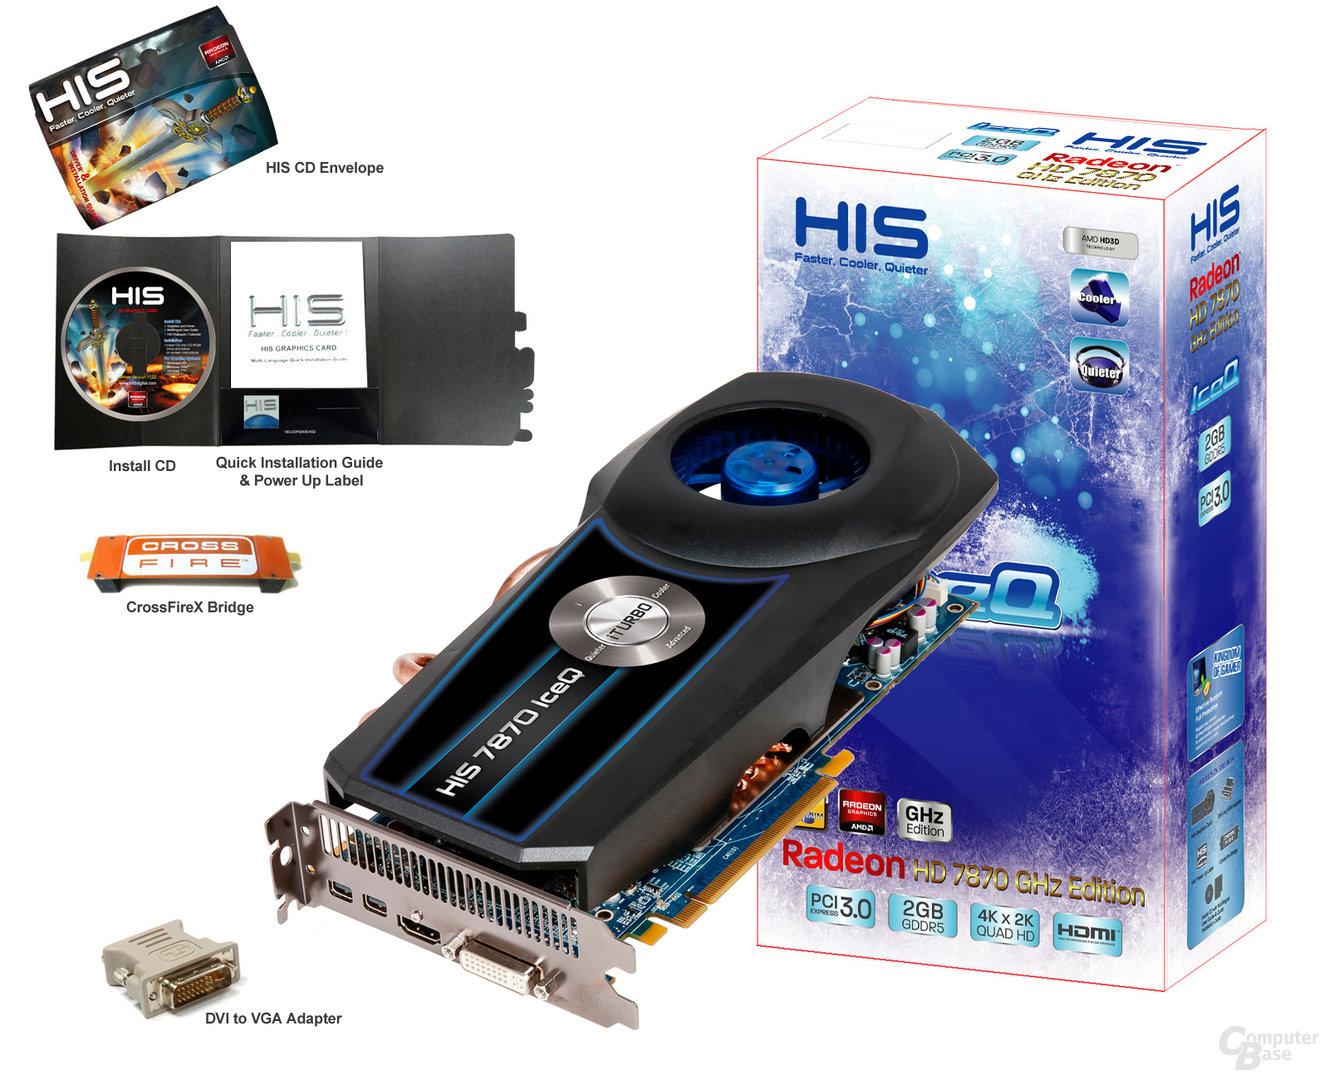 HIS Radeon HD 7870 Turbo mit Verpackung